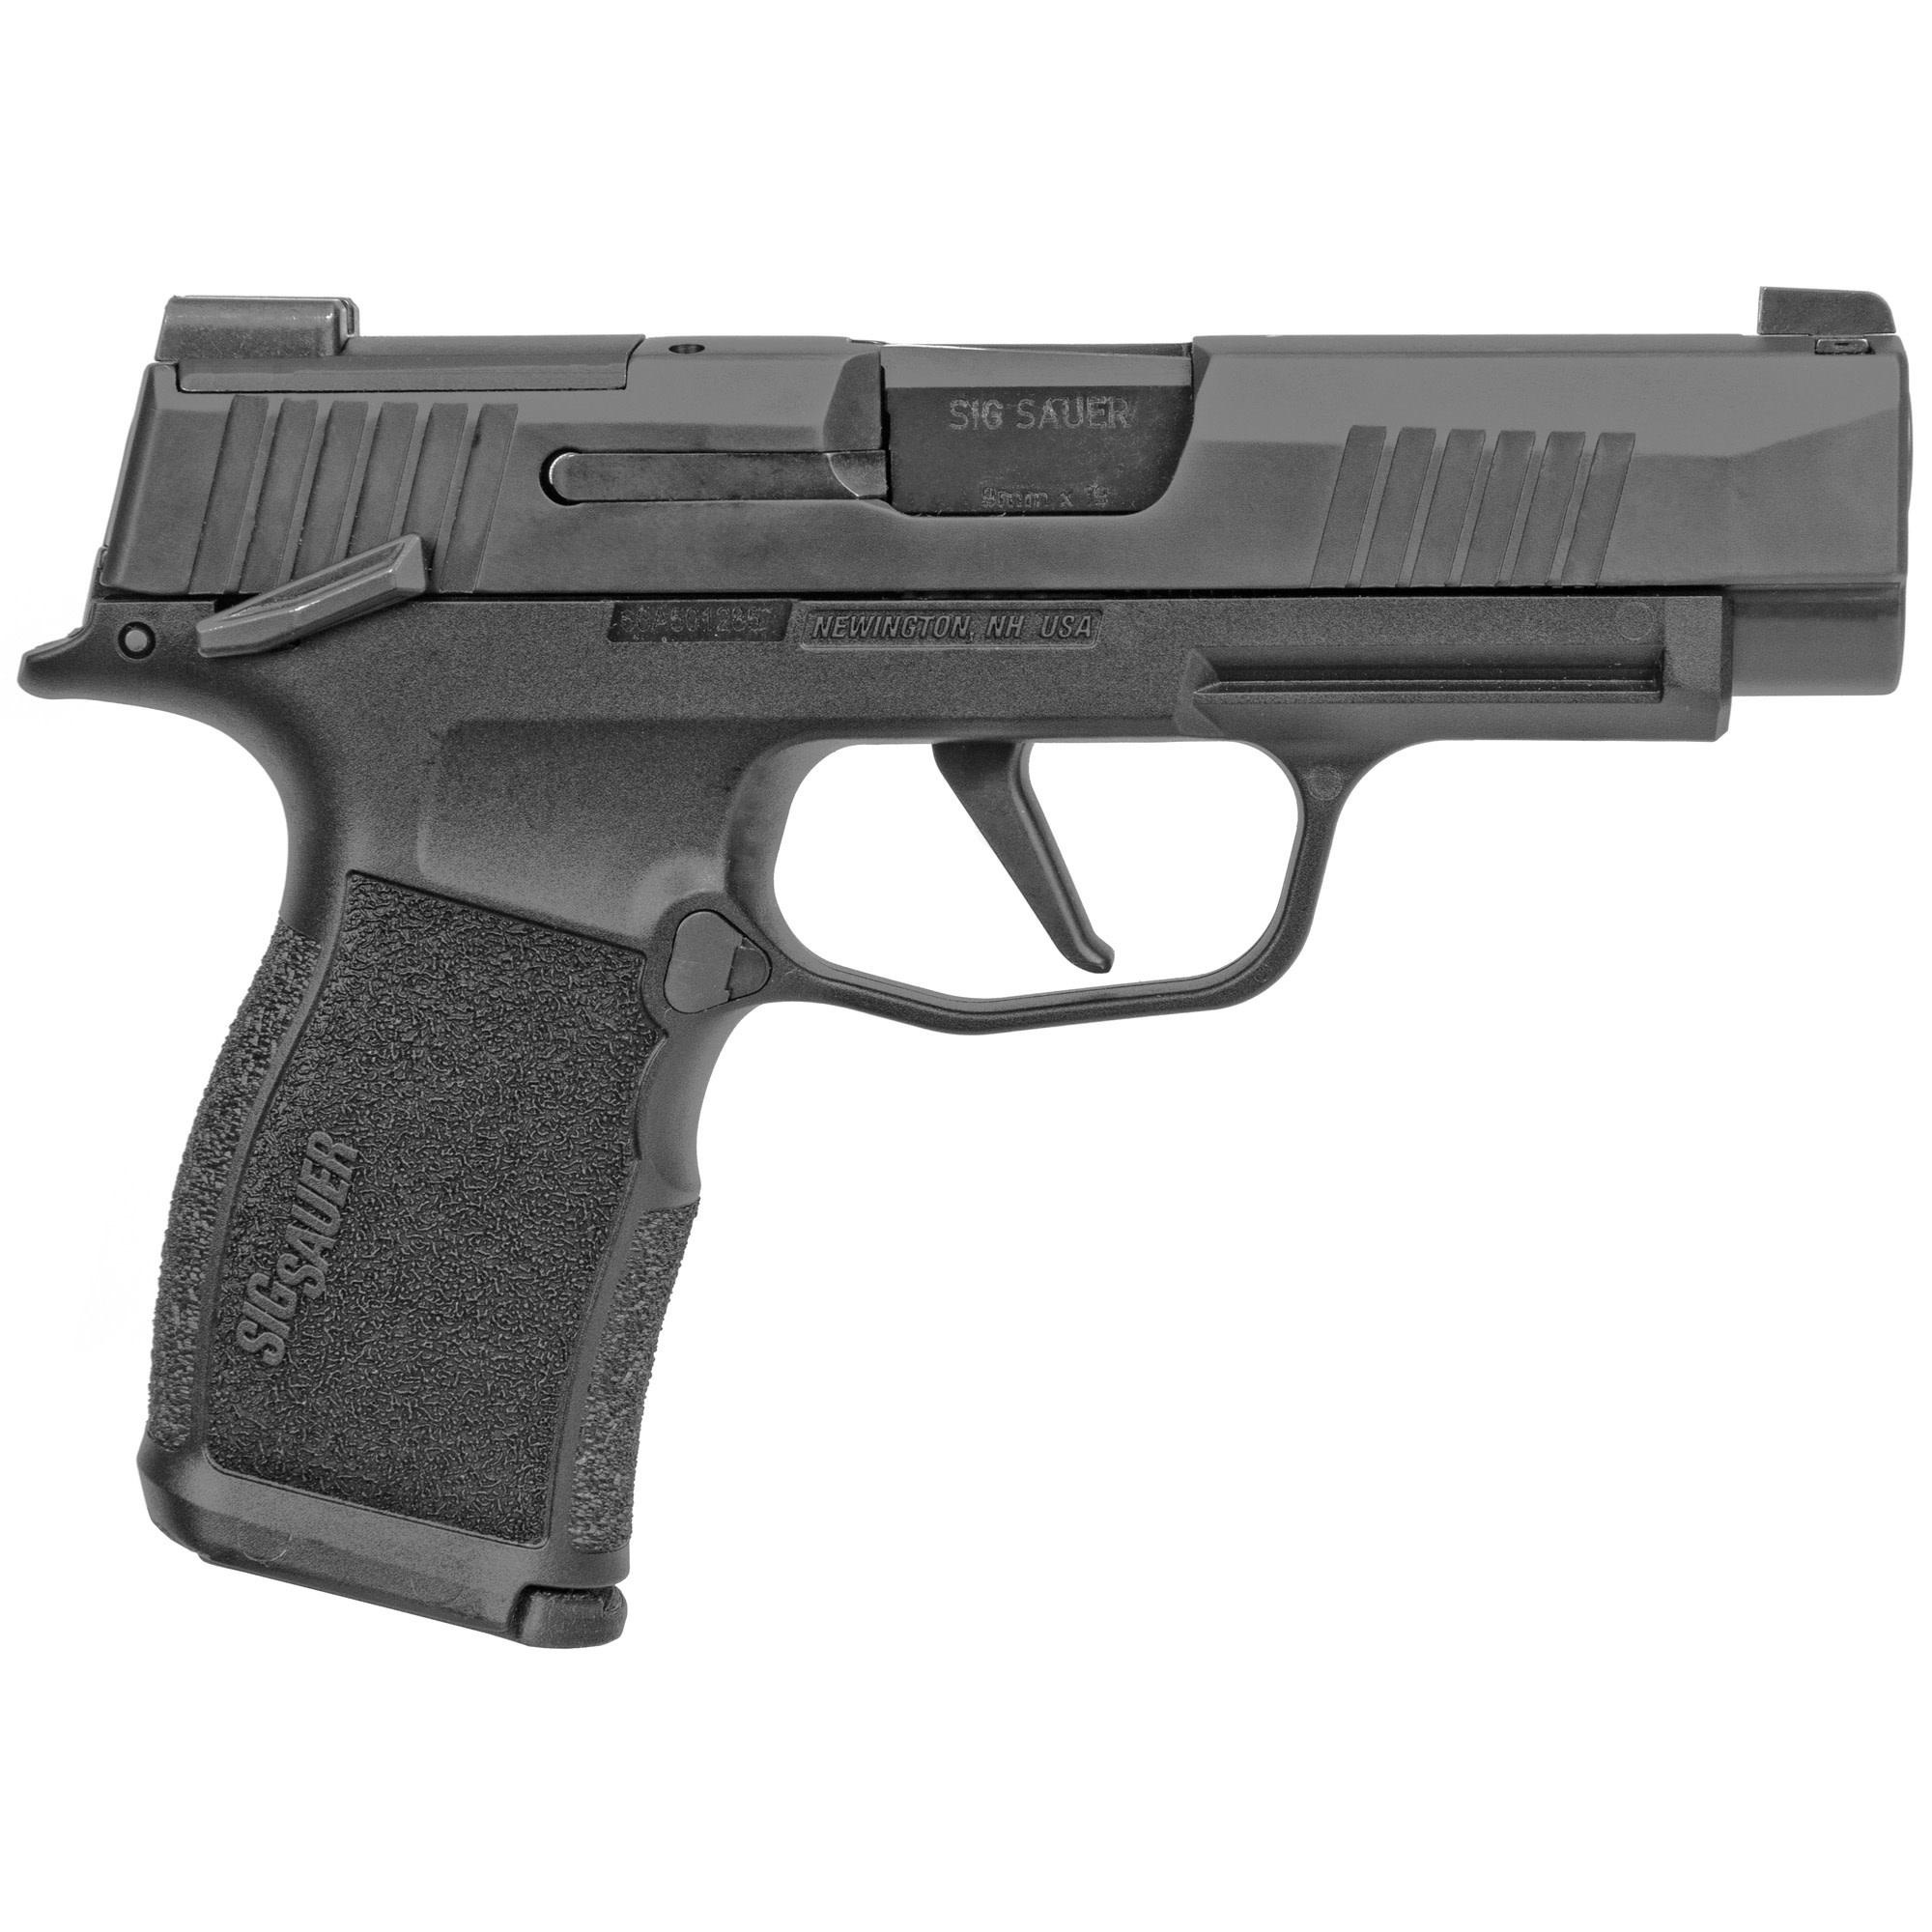 "Sig Sauer P365 XL, 9mm, 3.7"", 10+1, MANUAL SAFETY"